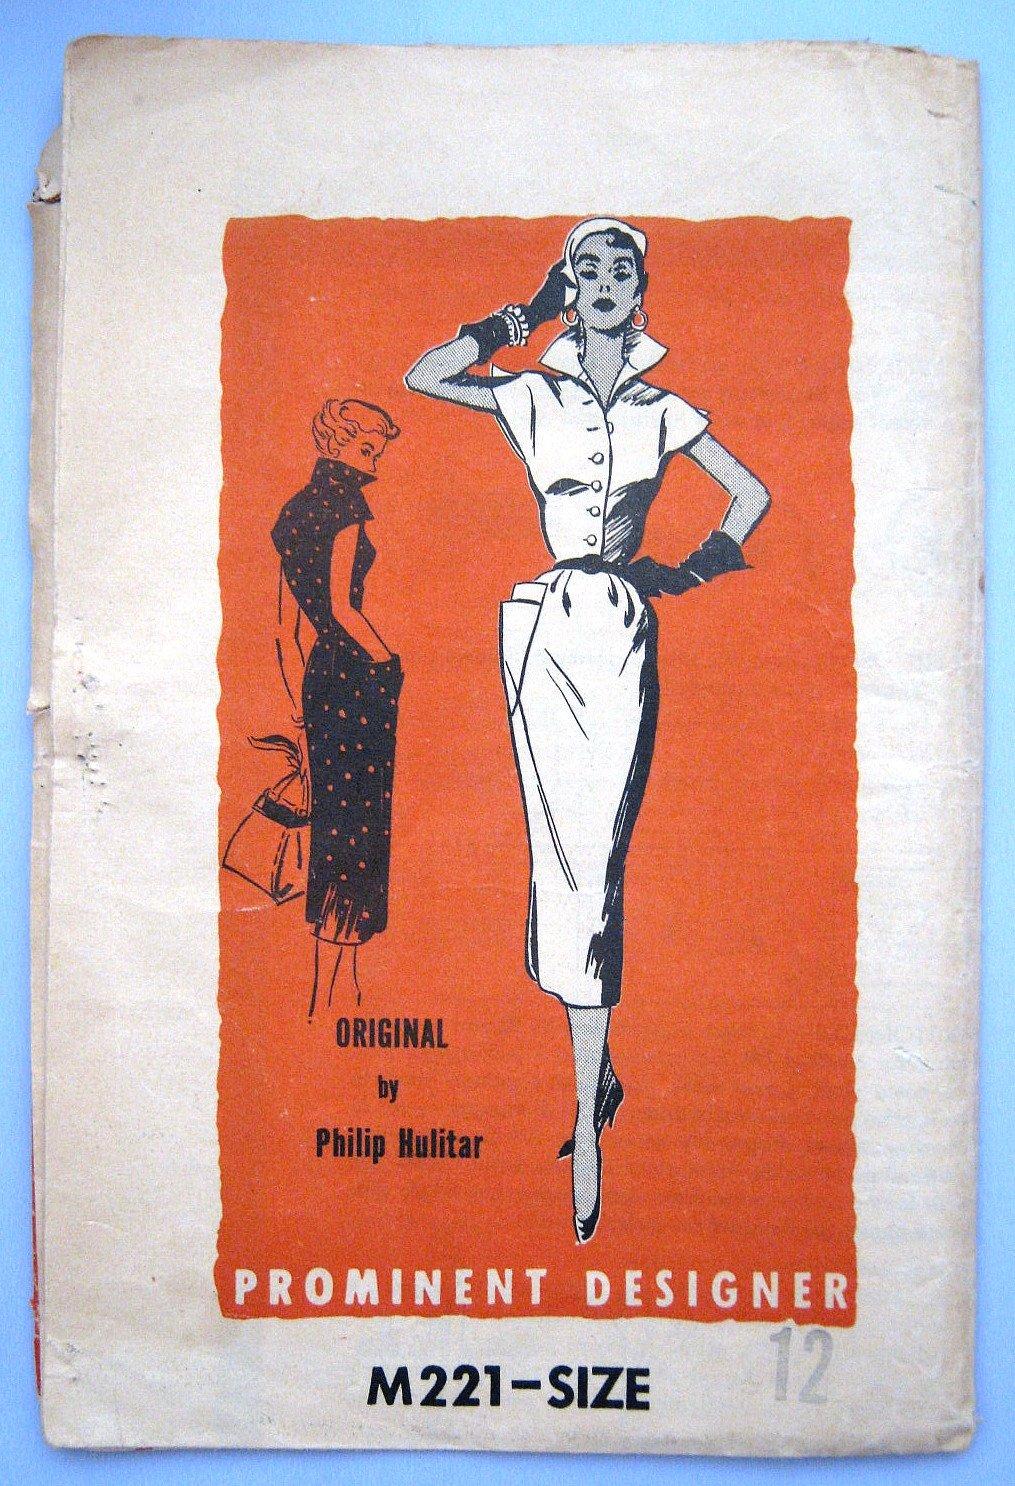 Vintage 1950s Pominent Designer Philip Hulitar Wiggle Dress Sewing Pattern  M221 Size 12 Bust 30